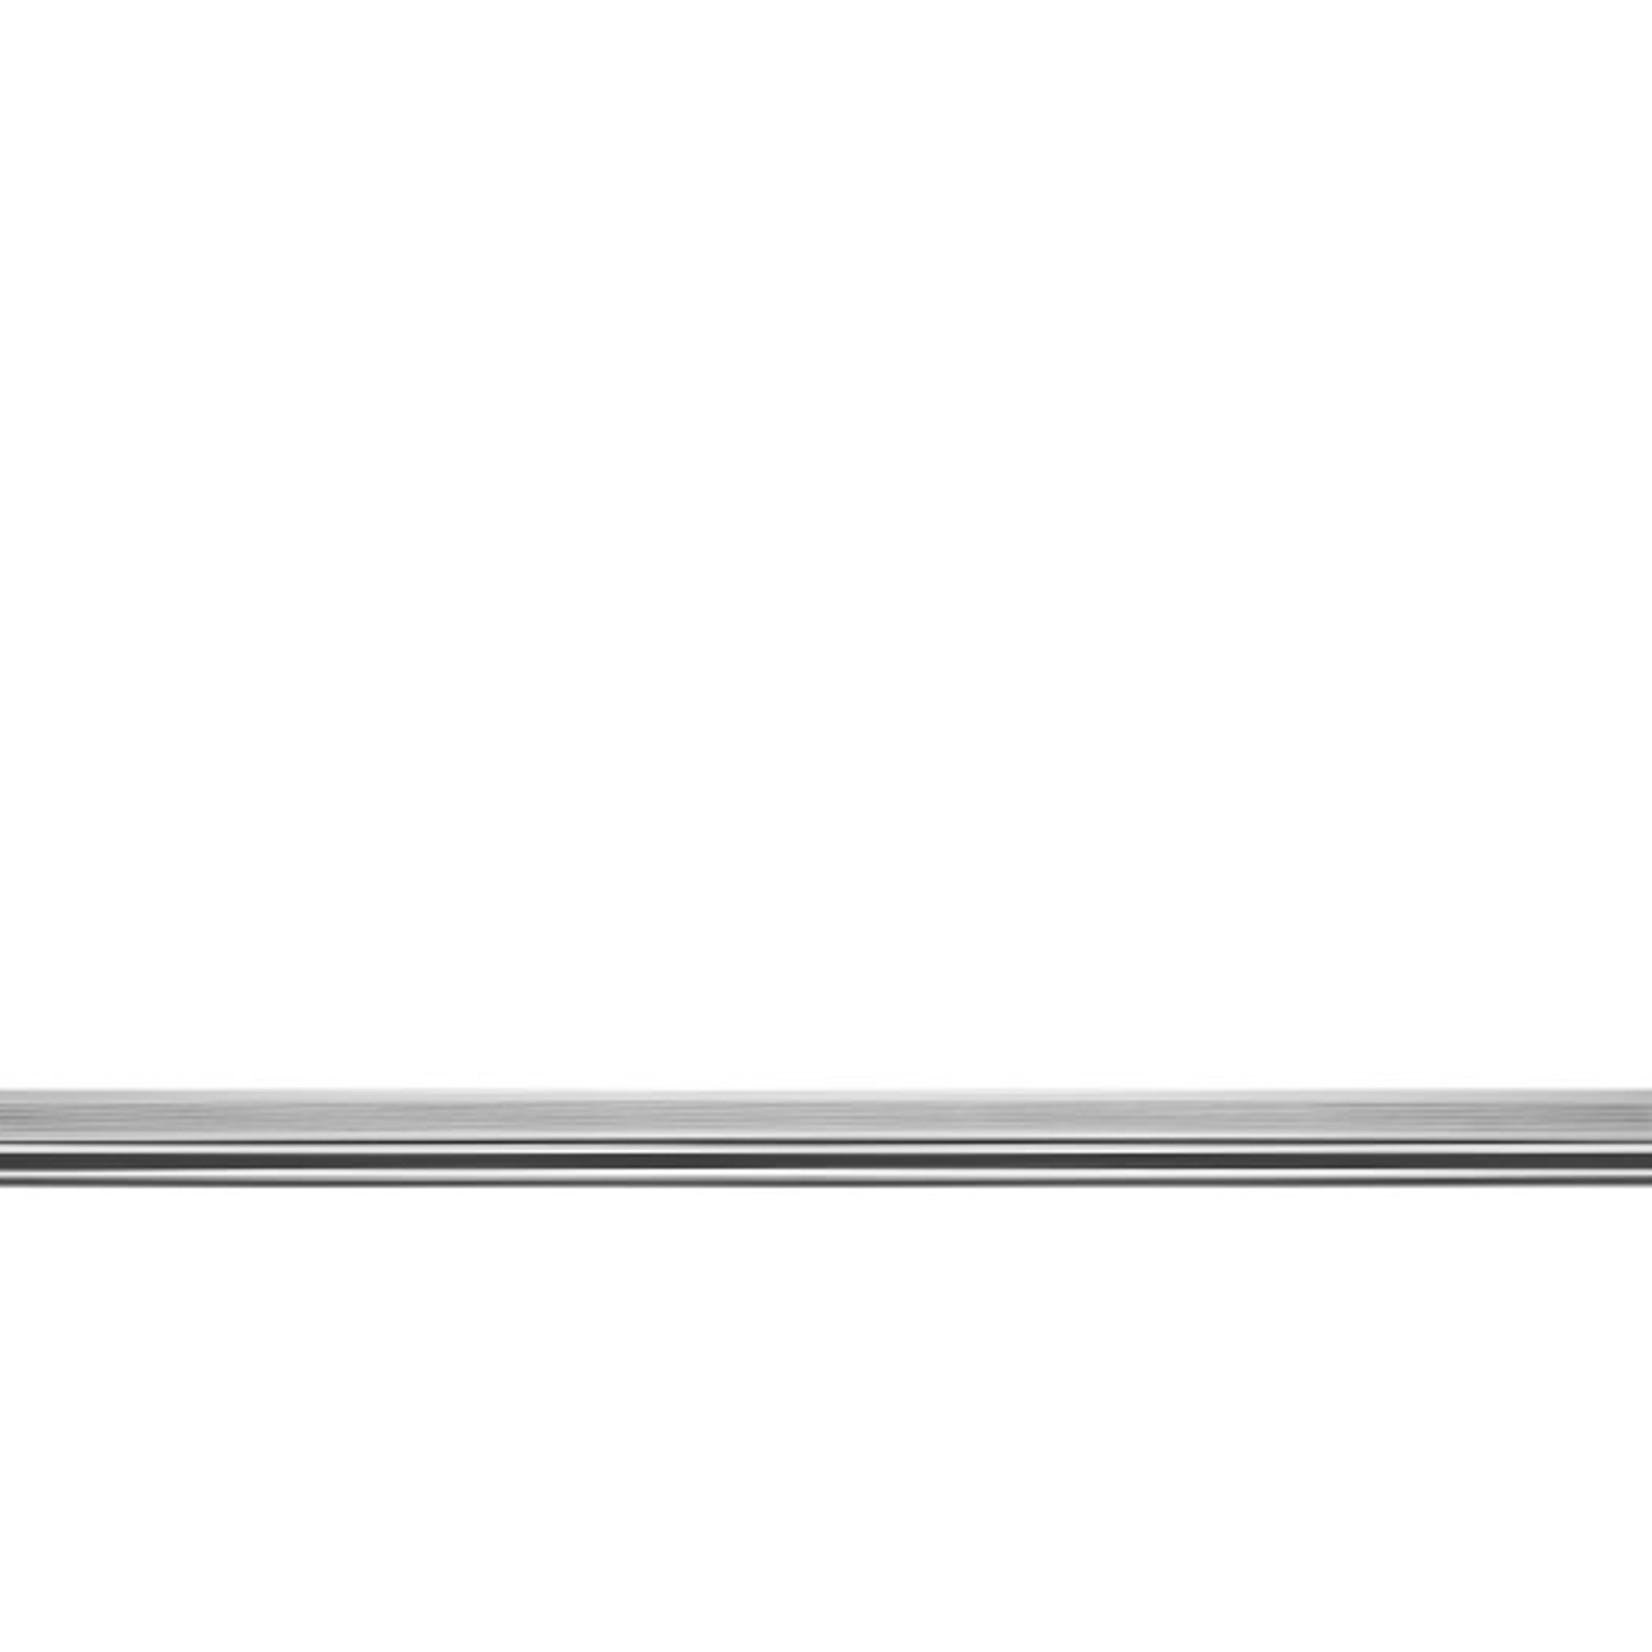 ADA AQUASKY G 601 (Single light type) complete System